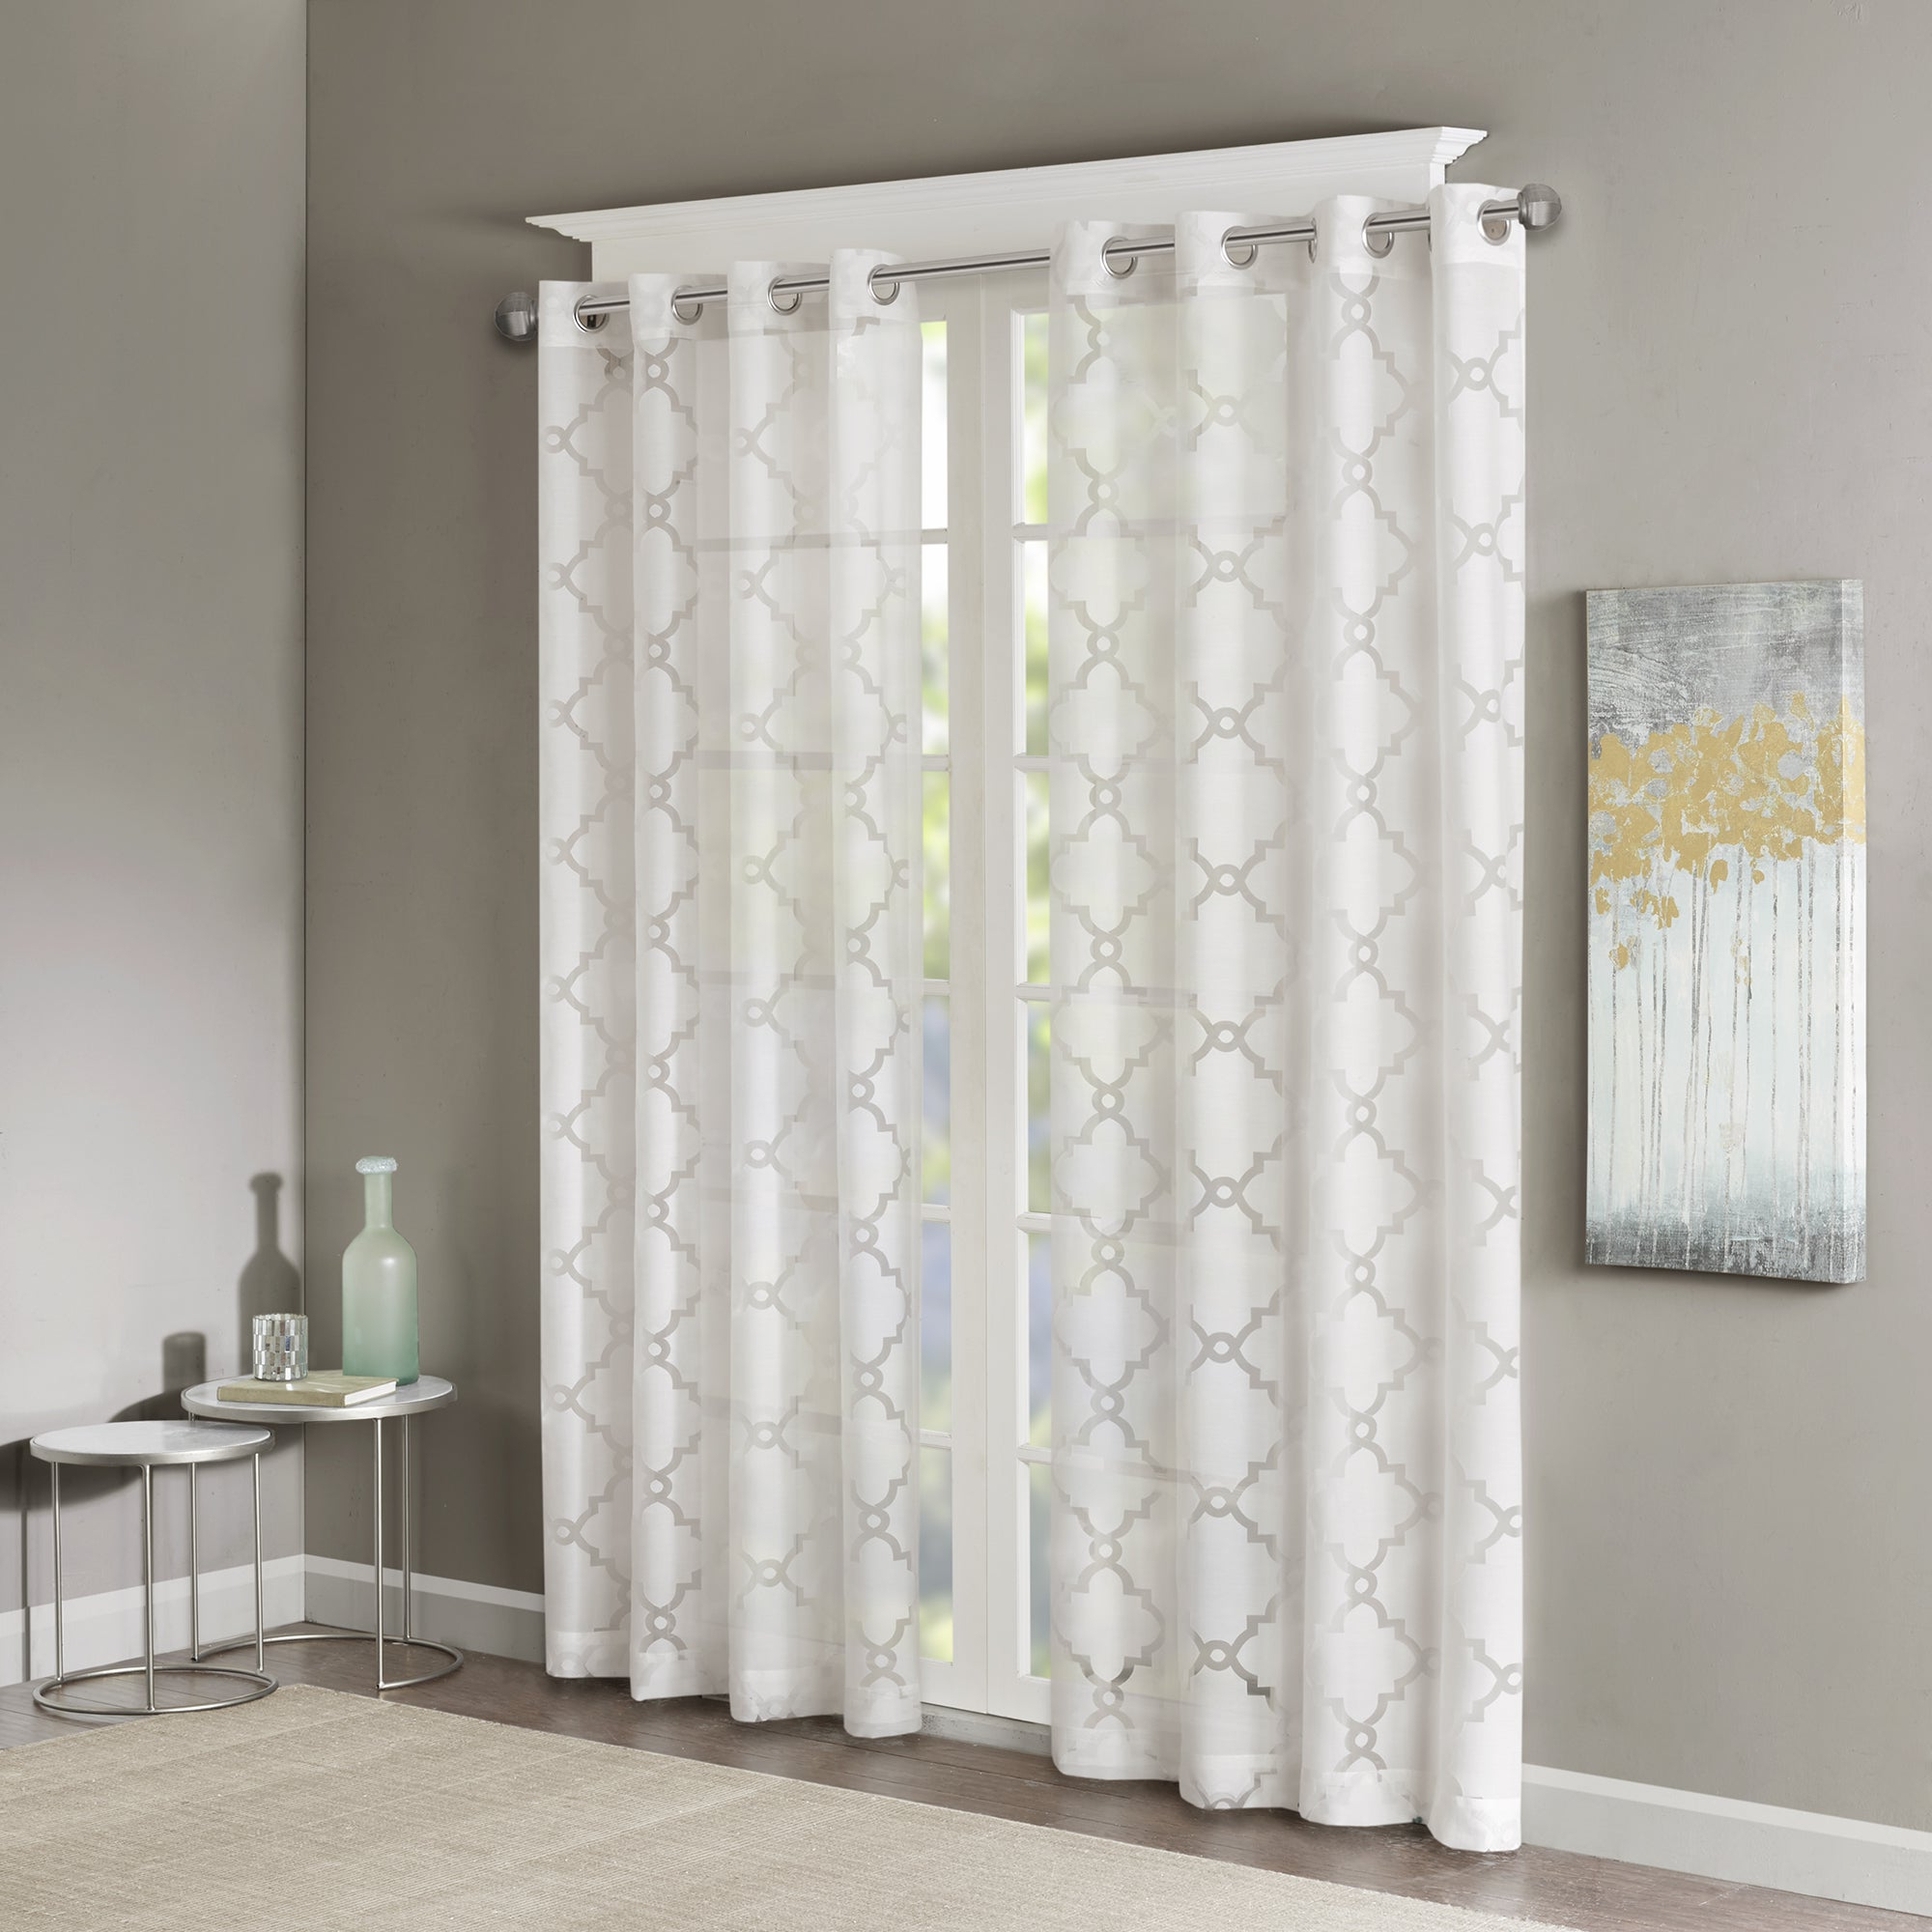 Vina Sheer Bird Single Curtain Panels Regarding Best And Newest Madison Park Laya Fretwork Burnout Sheer Curtain Panel (View 10 of 20)